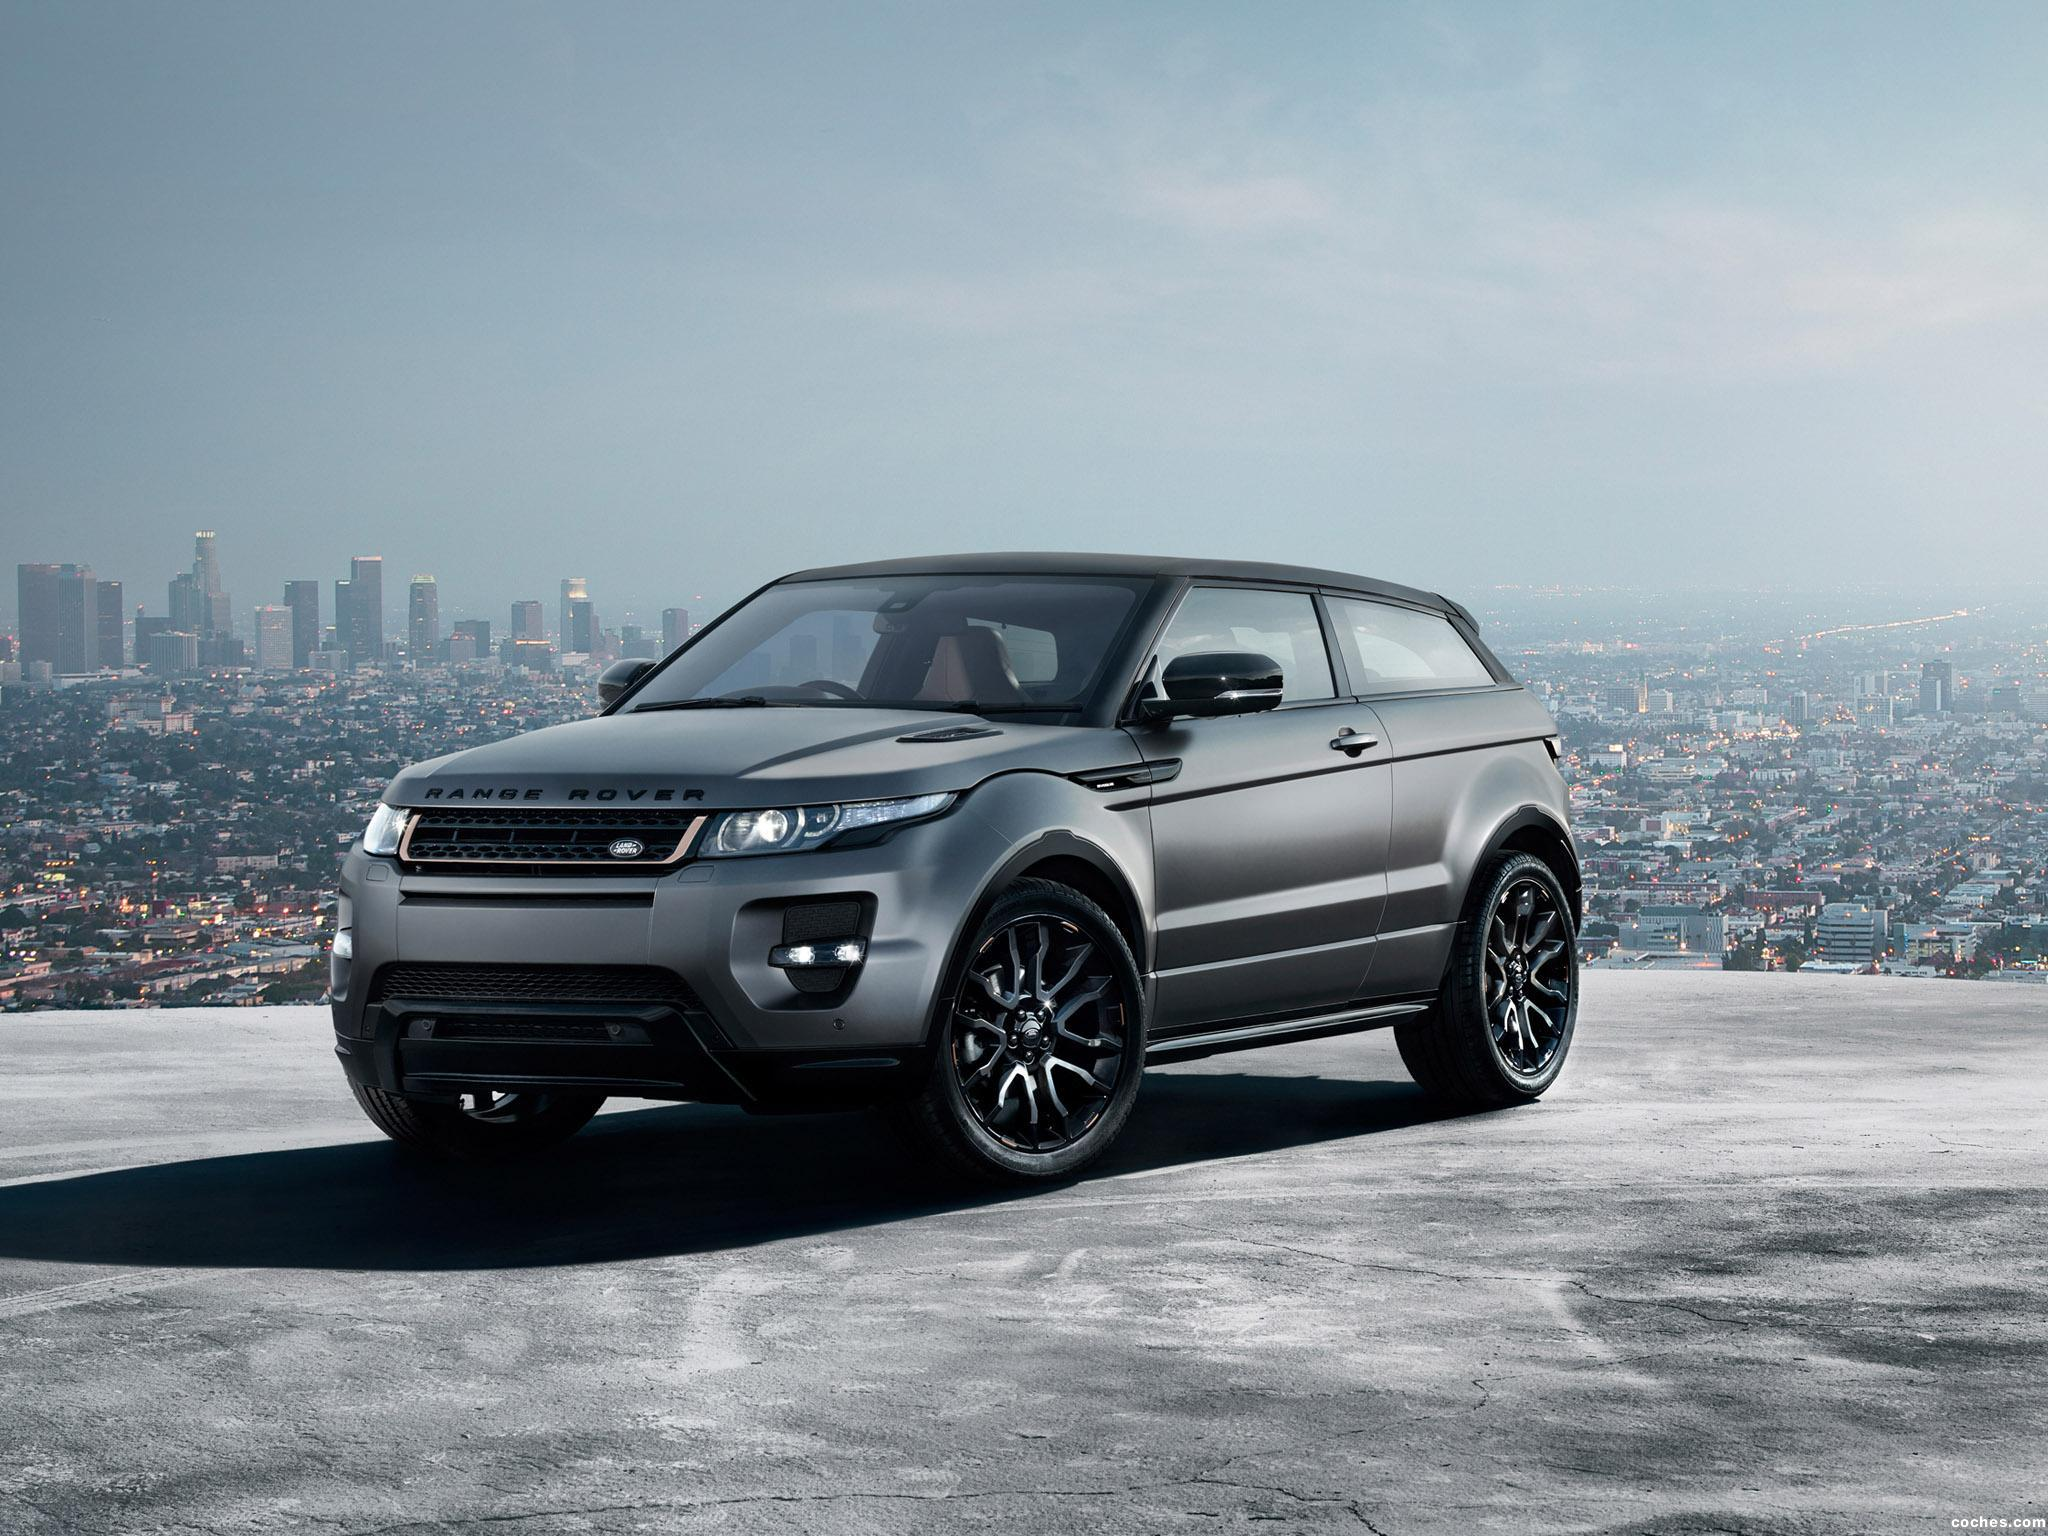 Foto 7 de Range Rover Evoque Victoria Beckham 2012